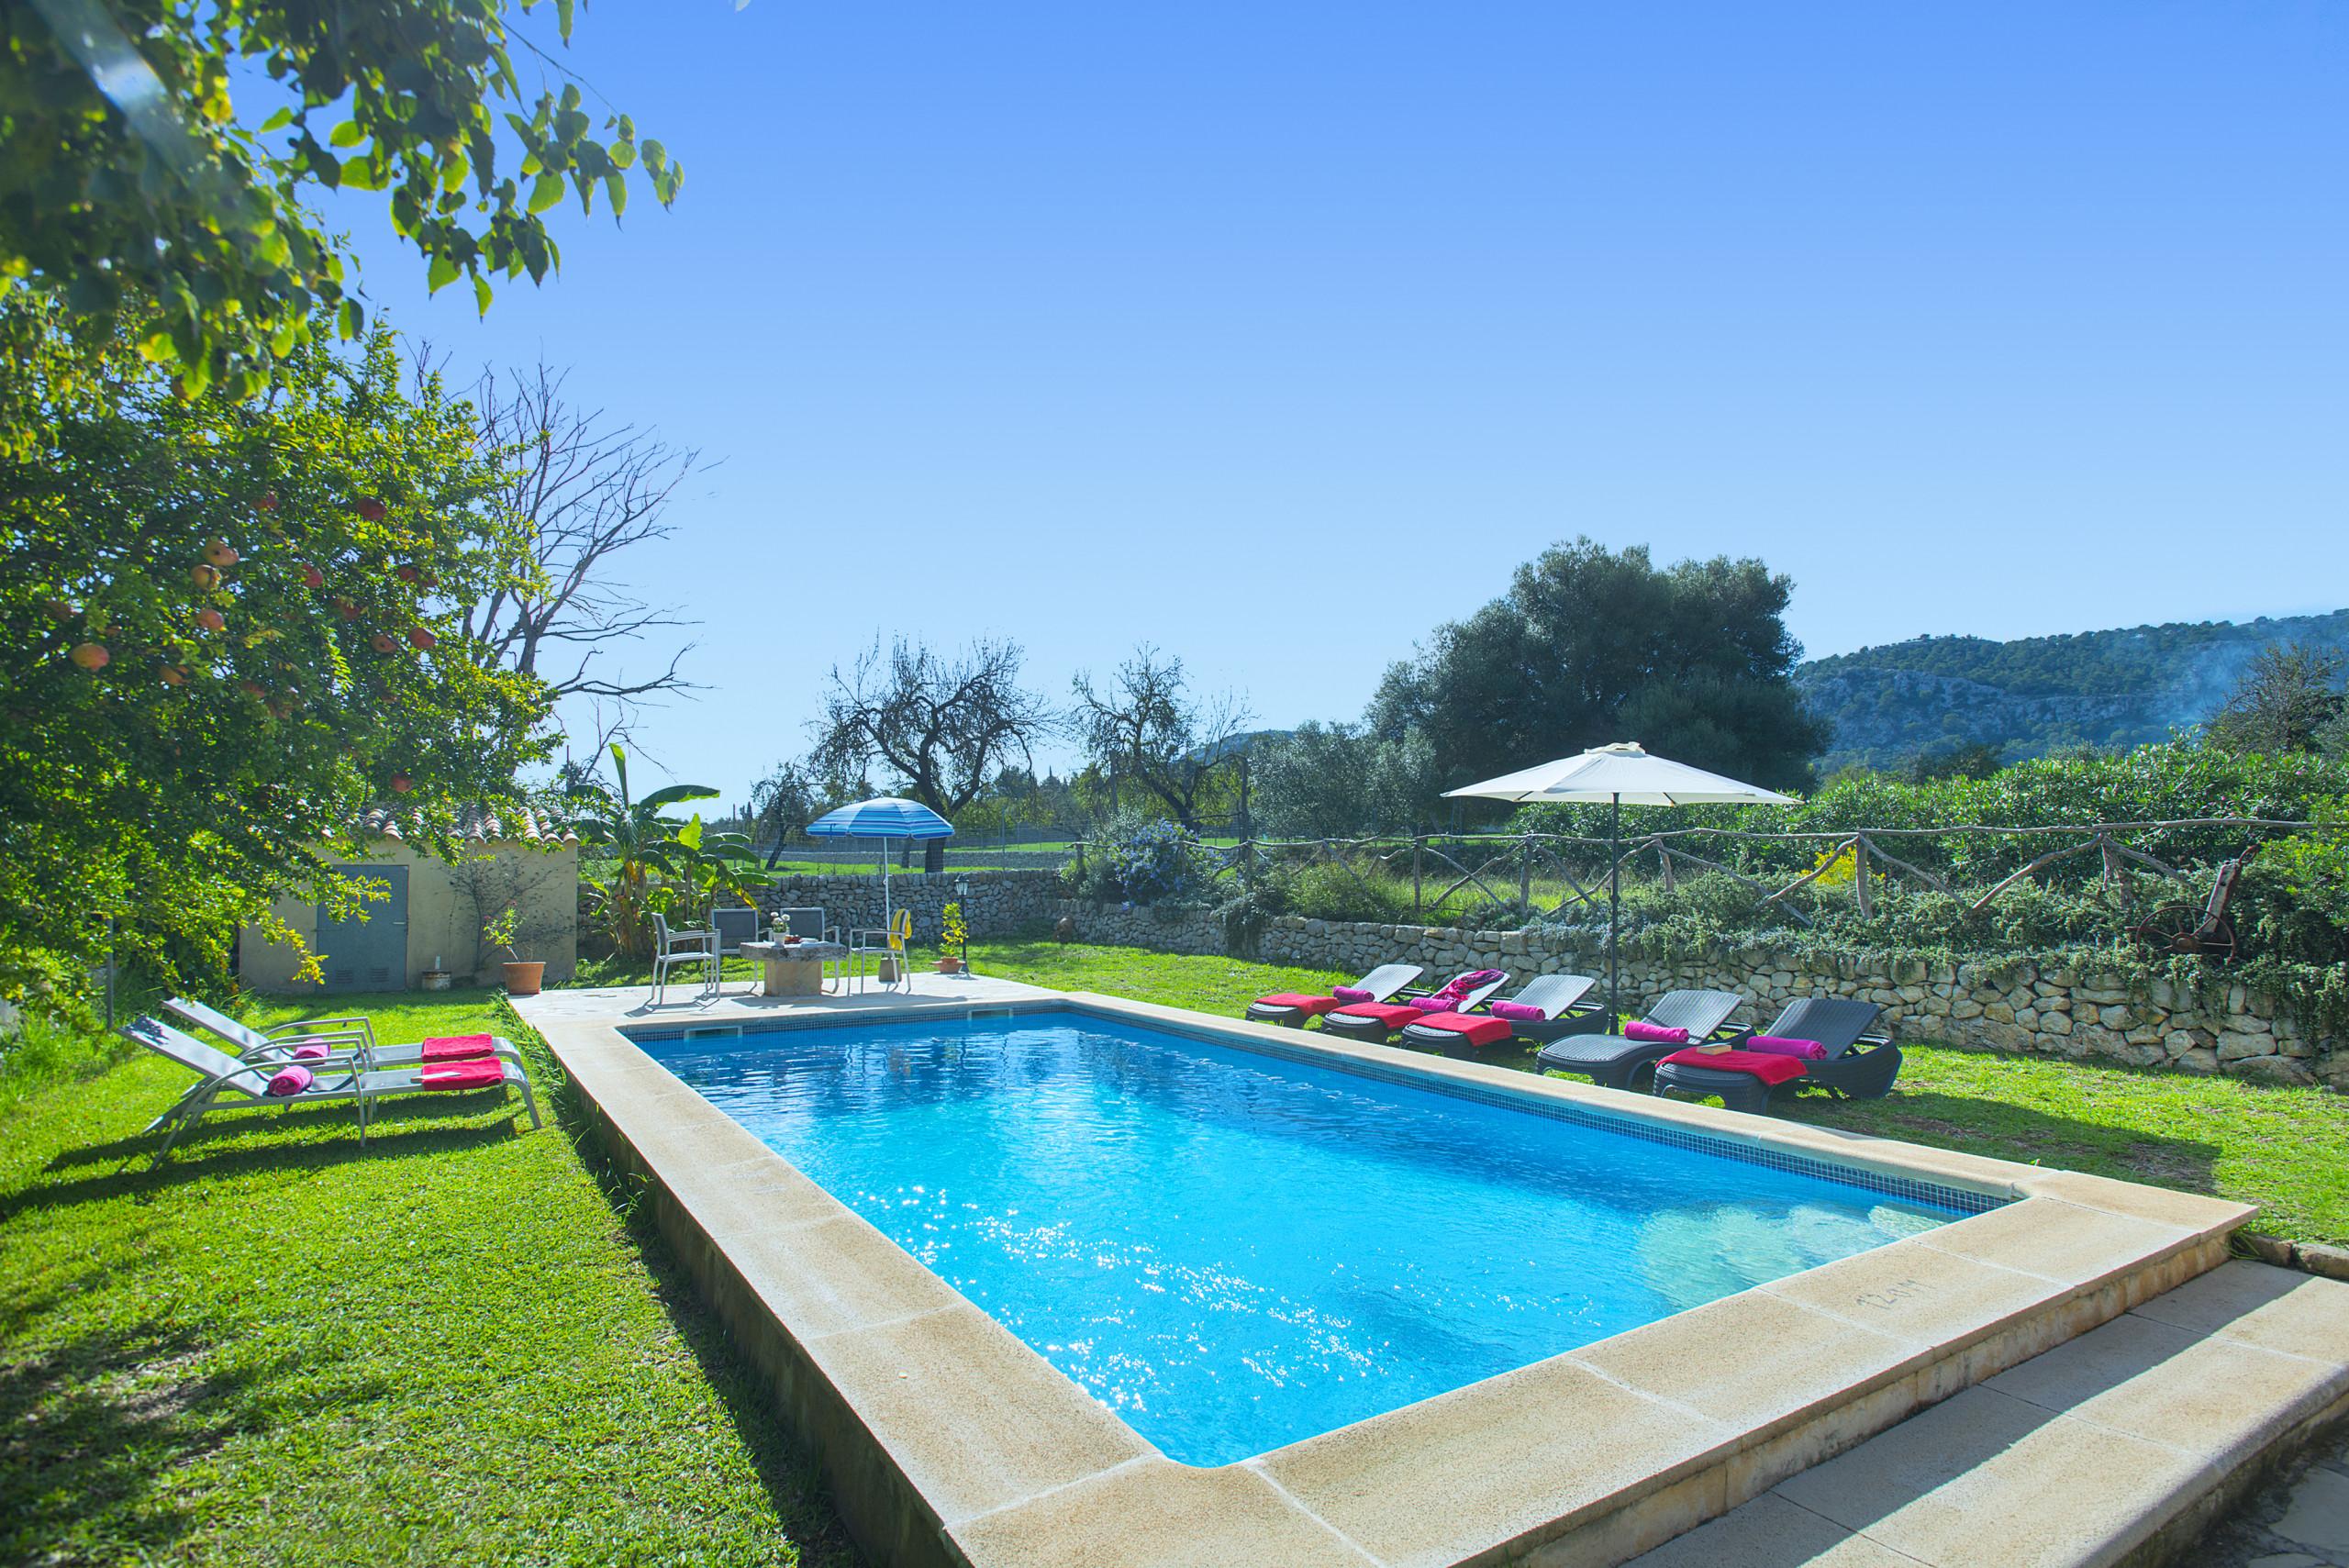 Villa With A Nice Pool And Umbrella ...